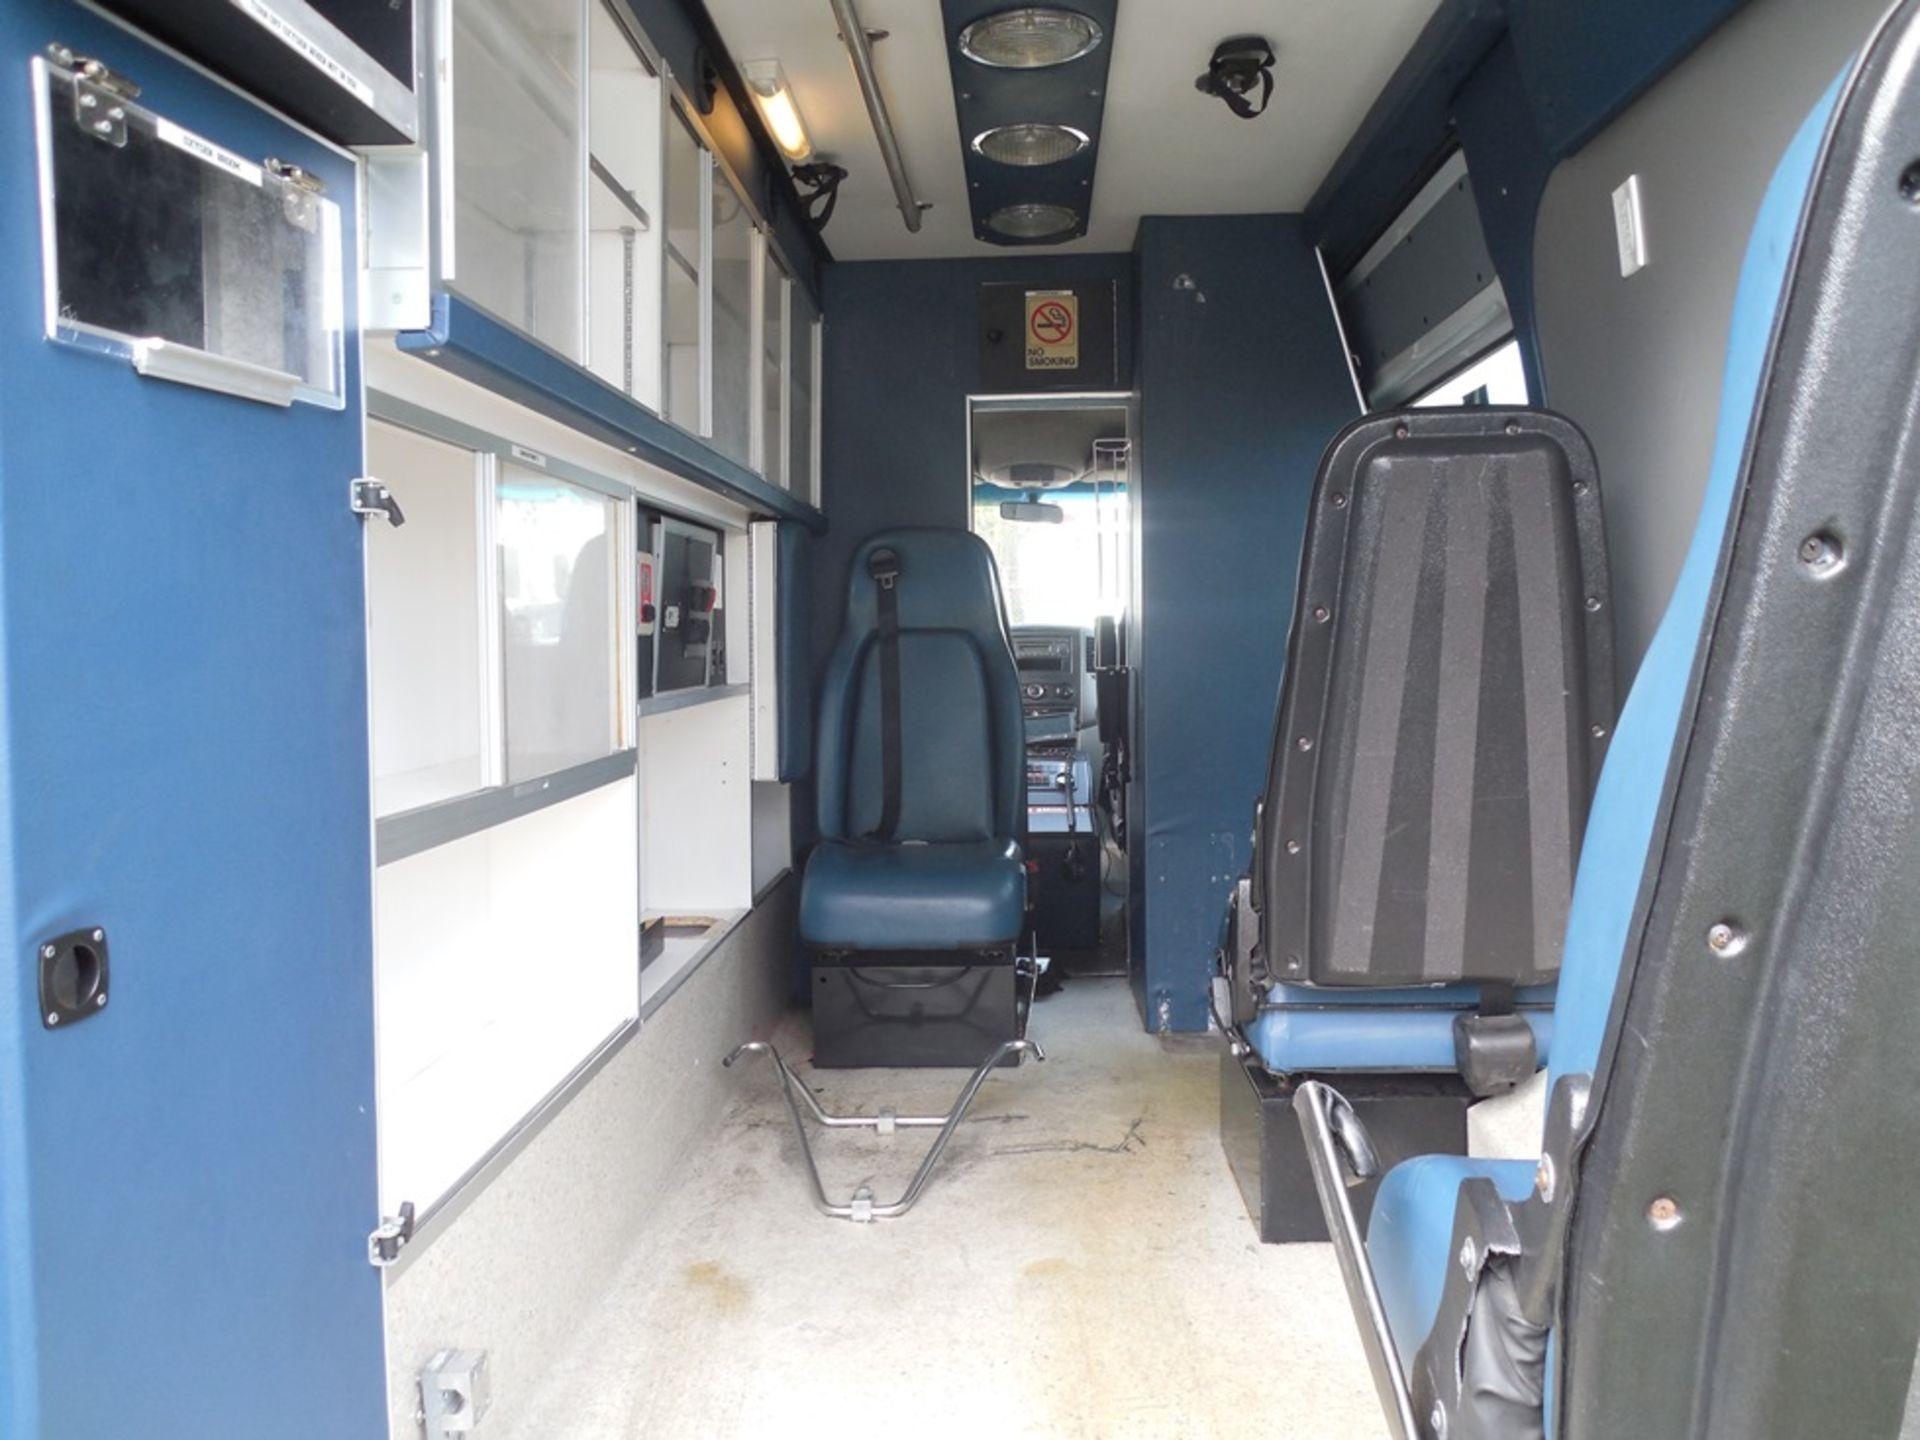 2010 Mercedes Sprinter dsl, ambulance 329,856 miles vin# WD3PE7CCXA5476270 - Image 6 of 6